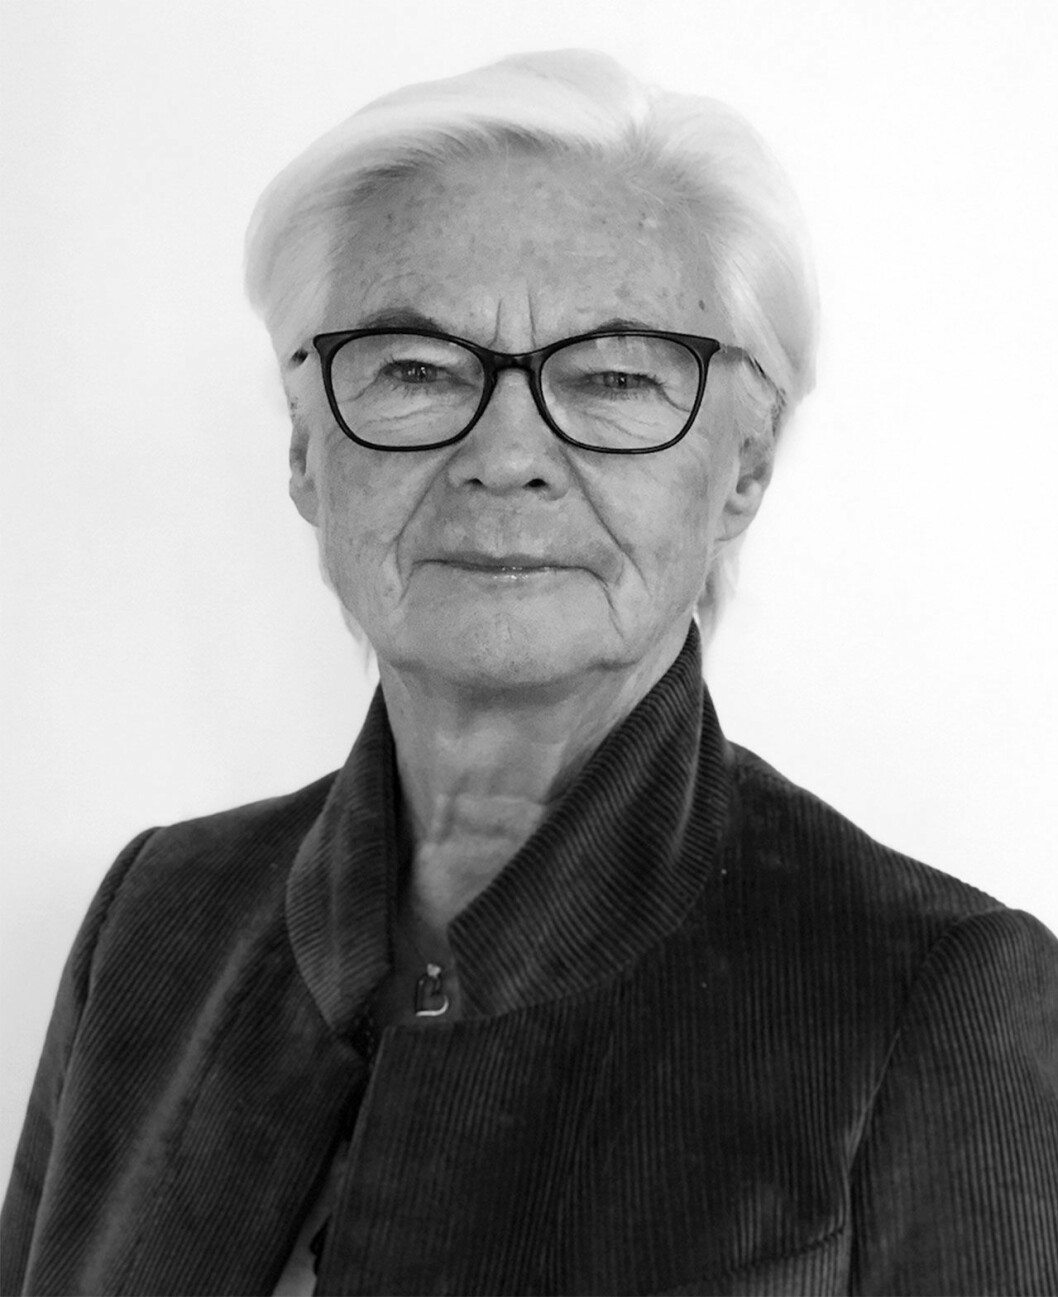 Elisabeth-Tarras-Wahlberg